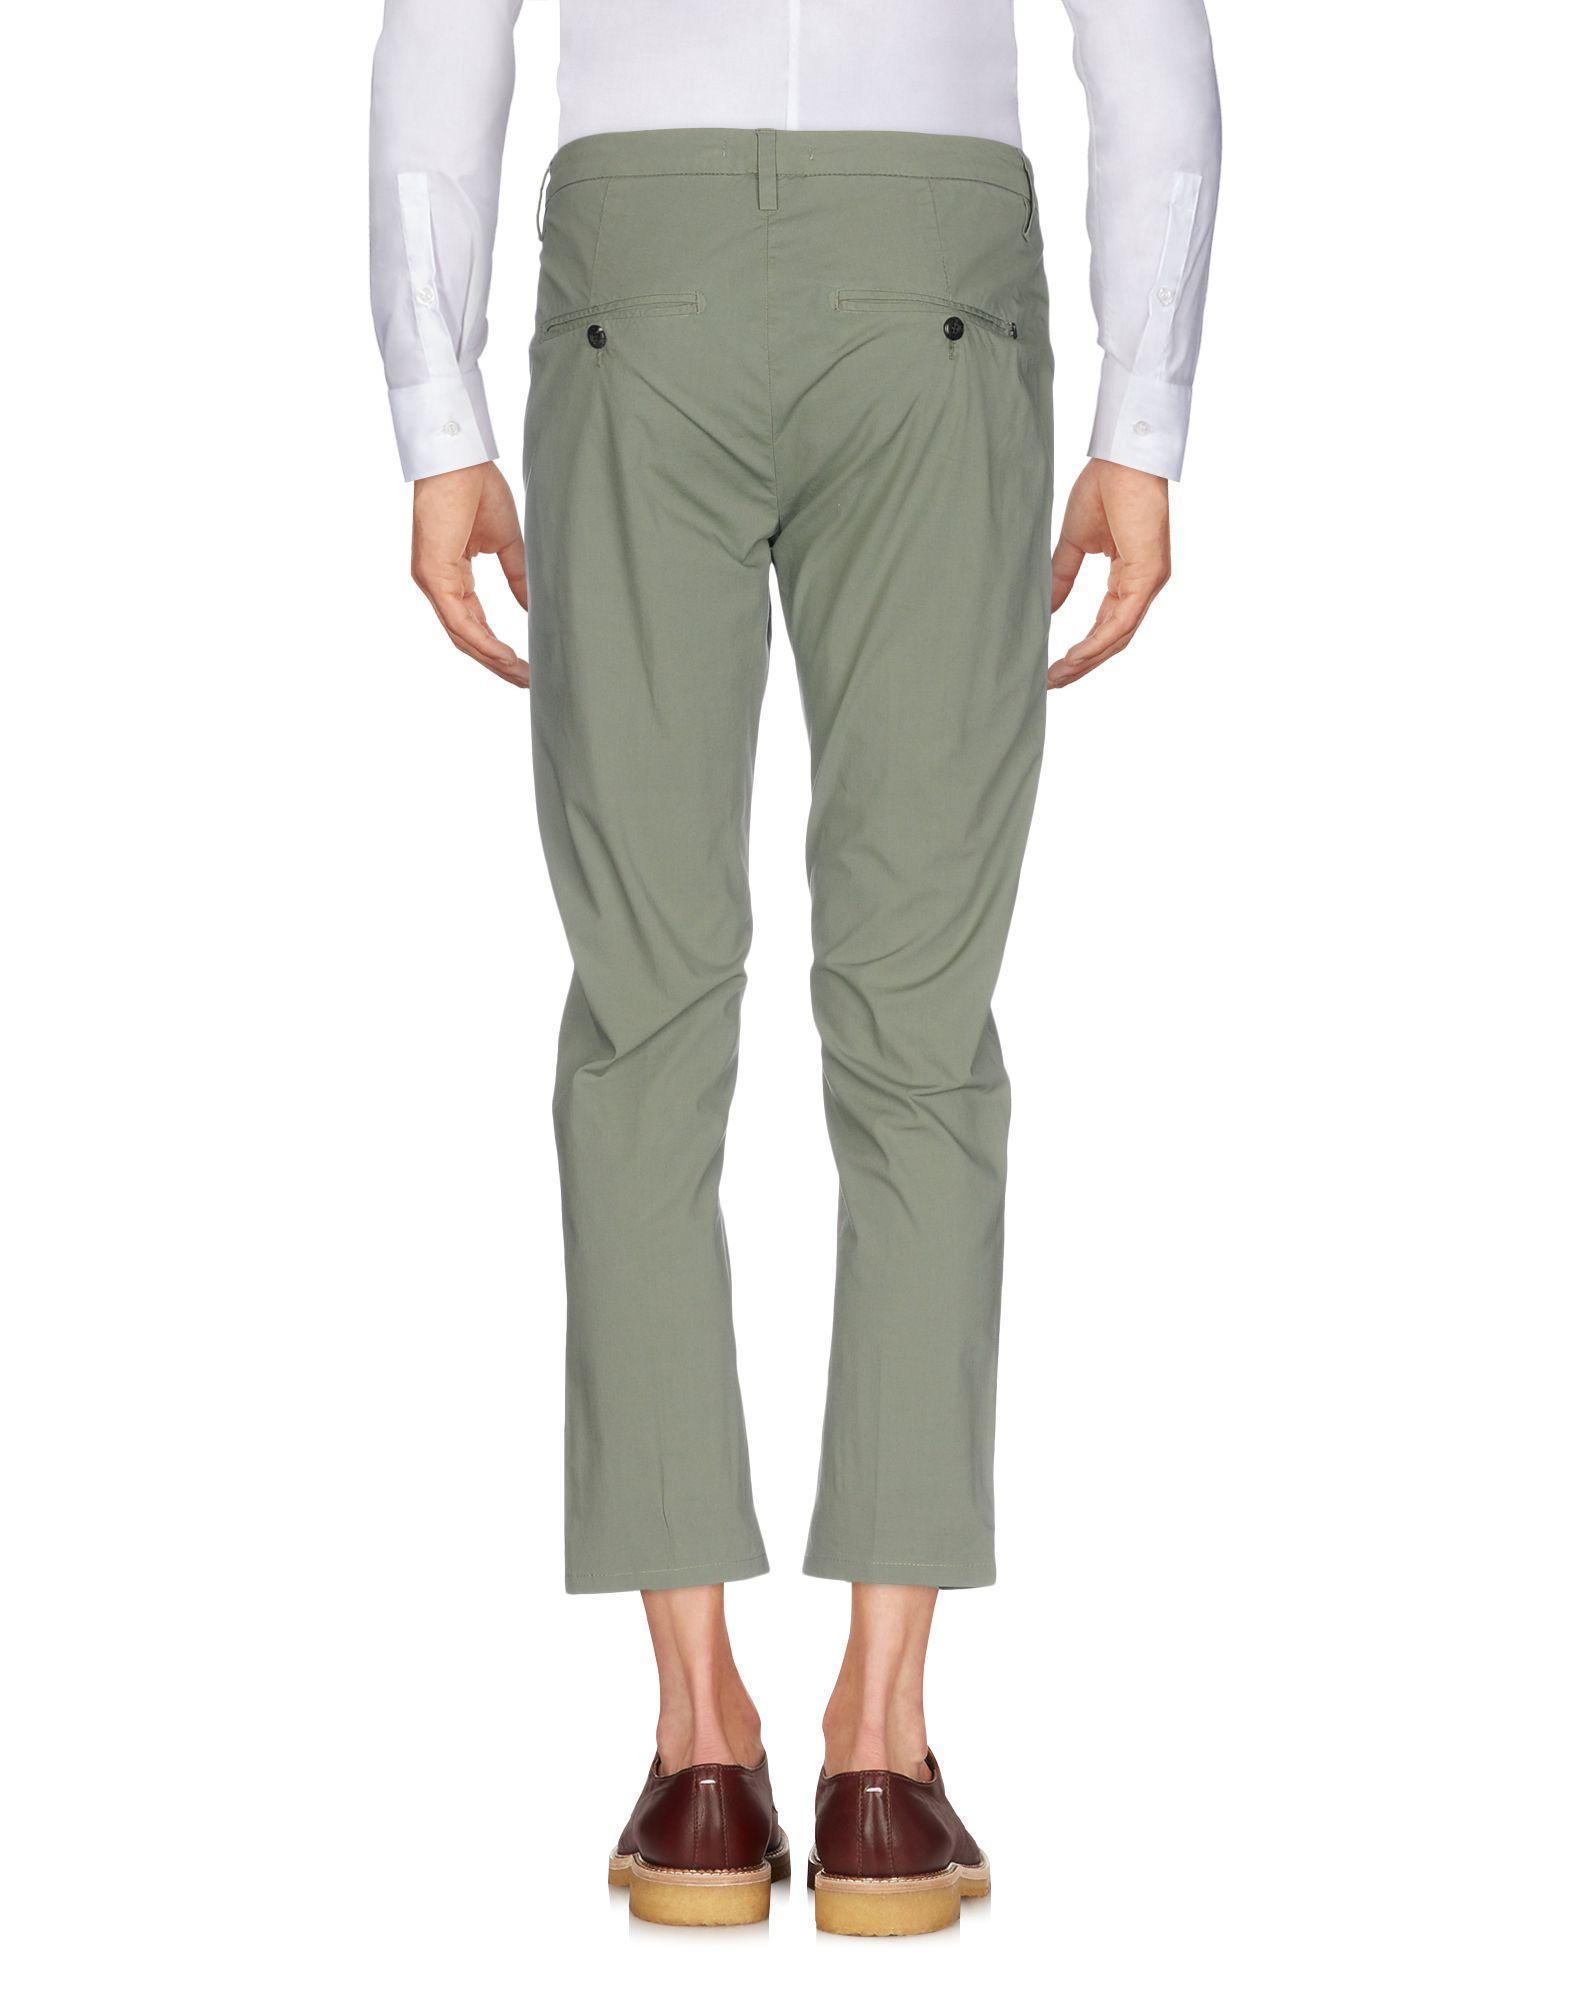 Dondup Cotton Casual Trouser in Light Green (Green) for Men